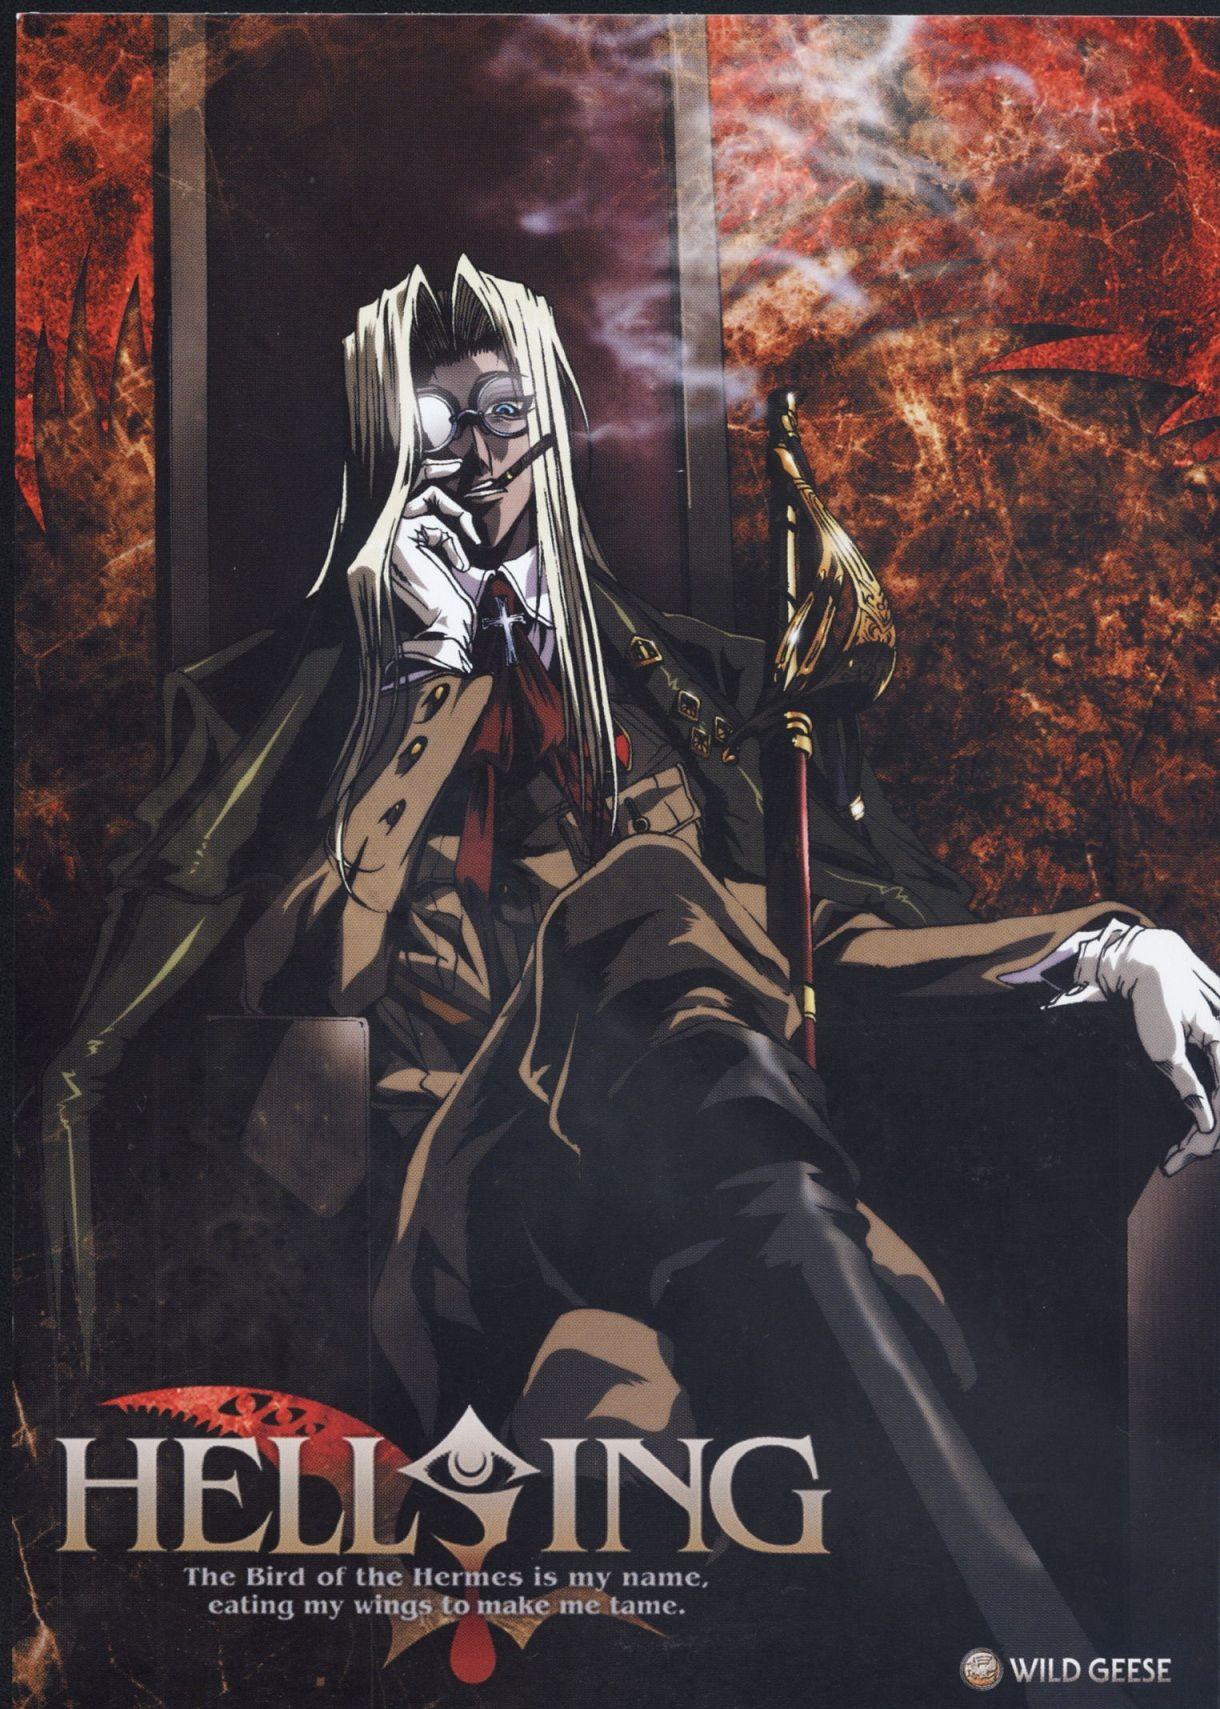 Hellsing Hellsing, Hellsing alucard, Alucard